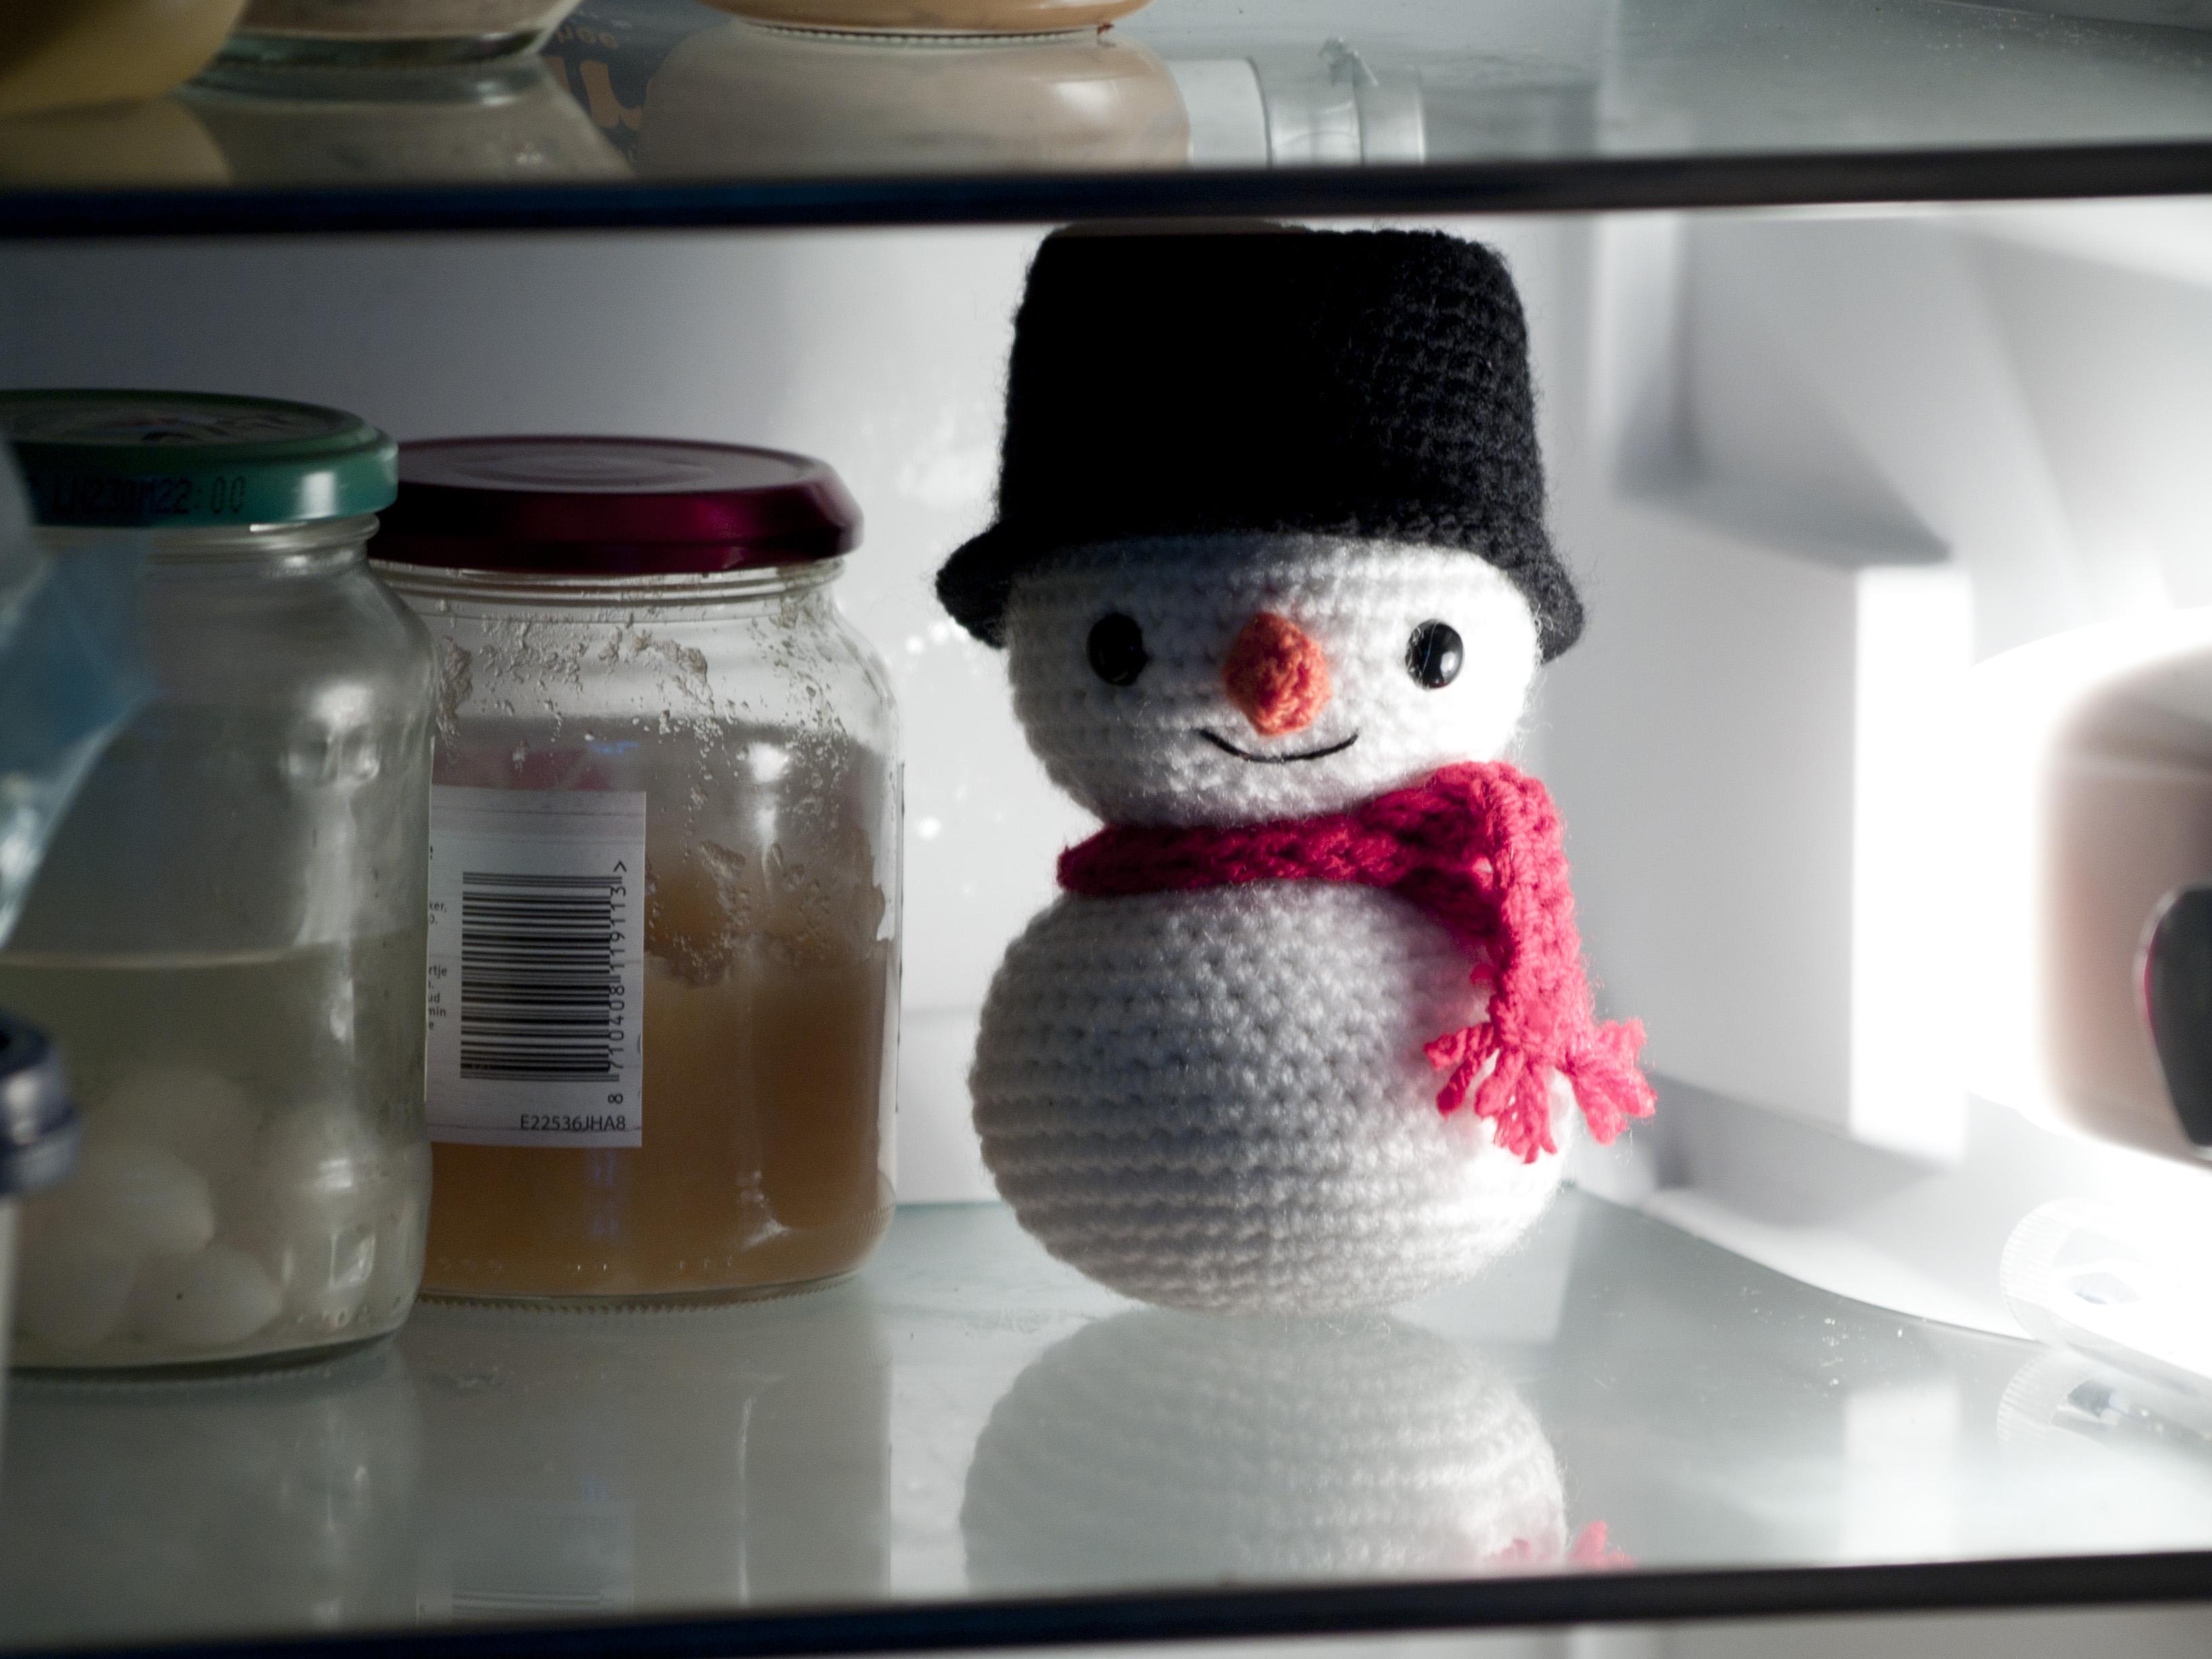 Amigurumi Snowman - AmigurumiWizard crochet pattern